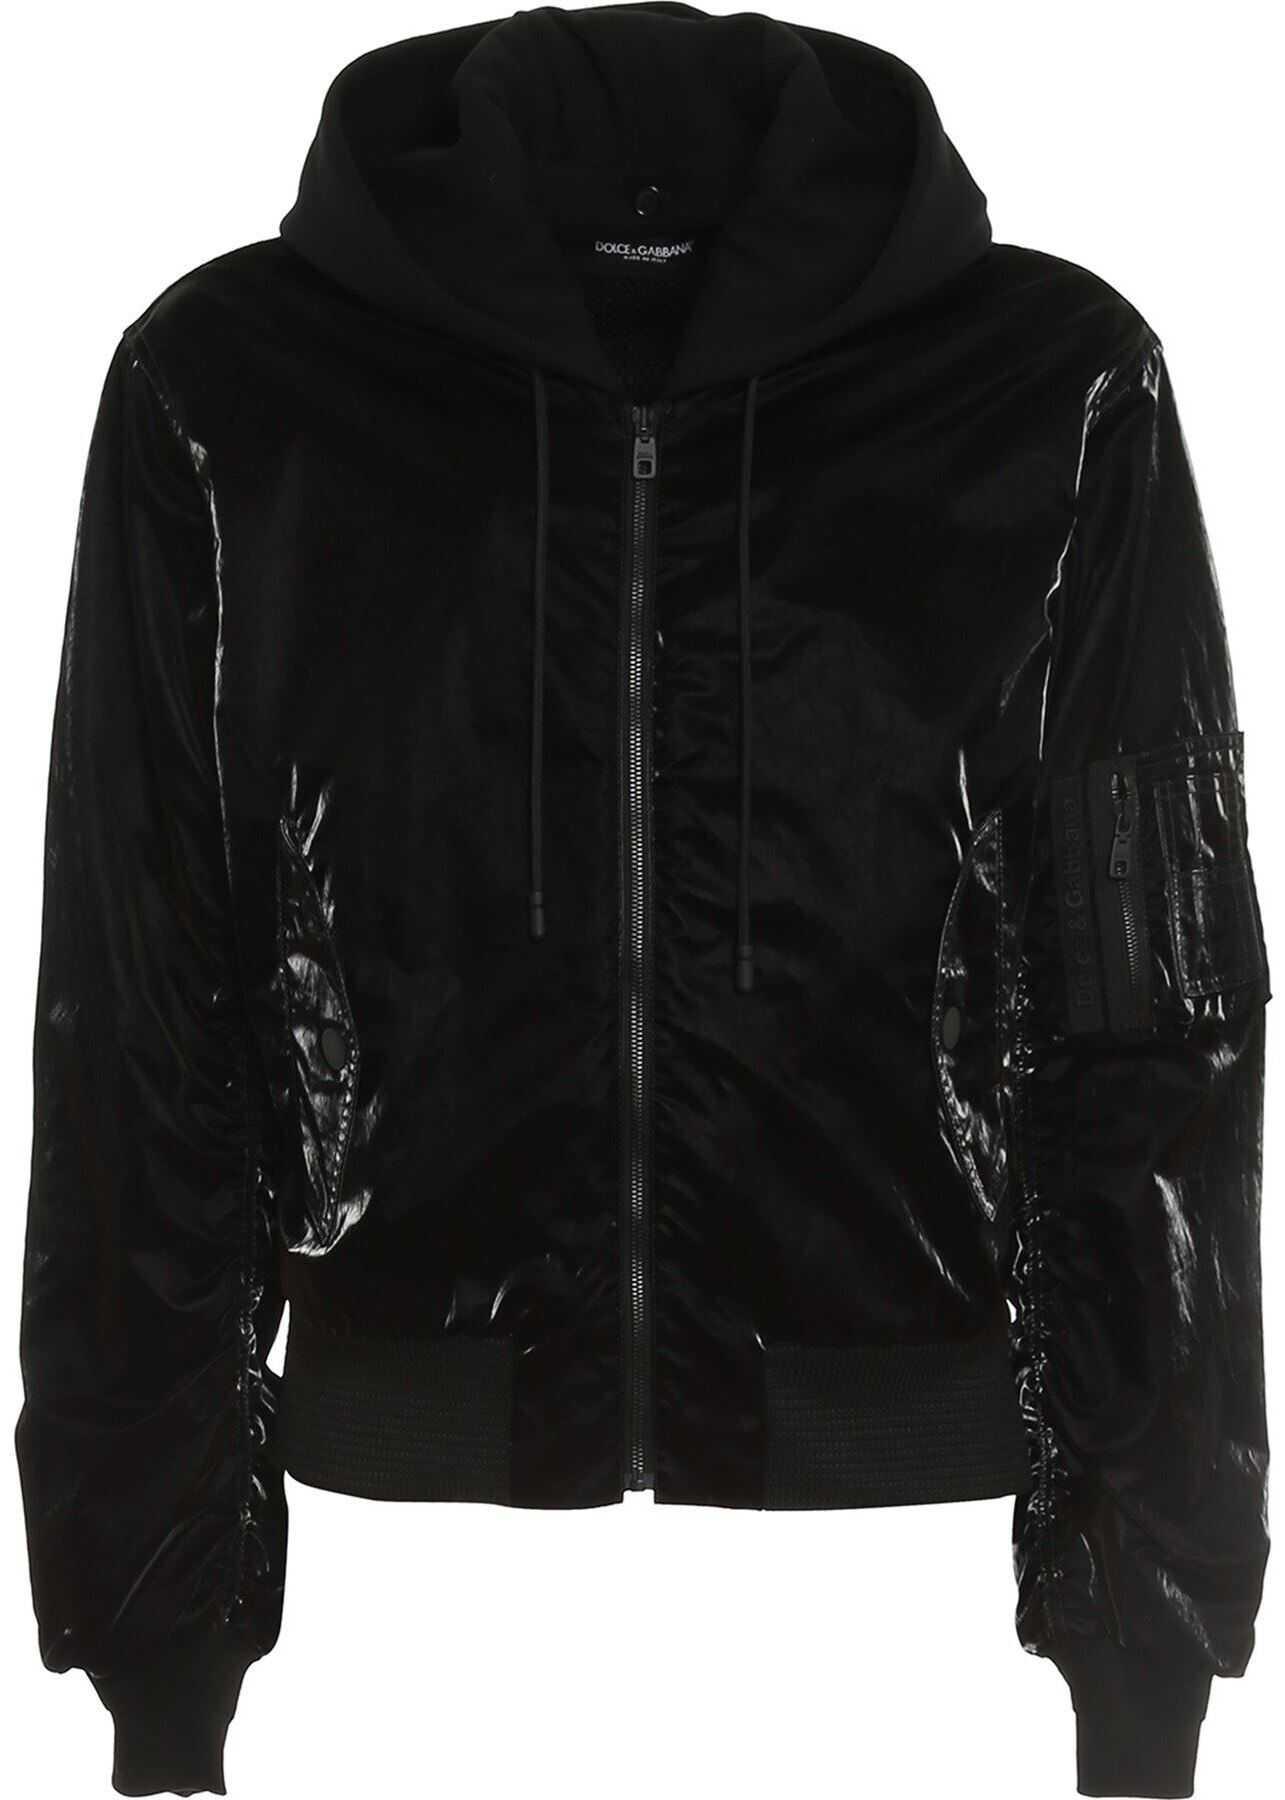 Dolce & Gabbana Reflective-Effect Bomber Jacketin Black Black imagine